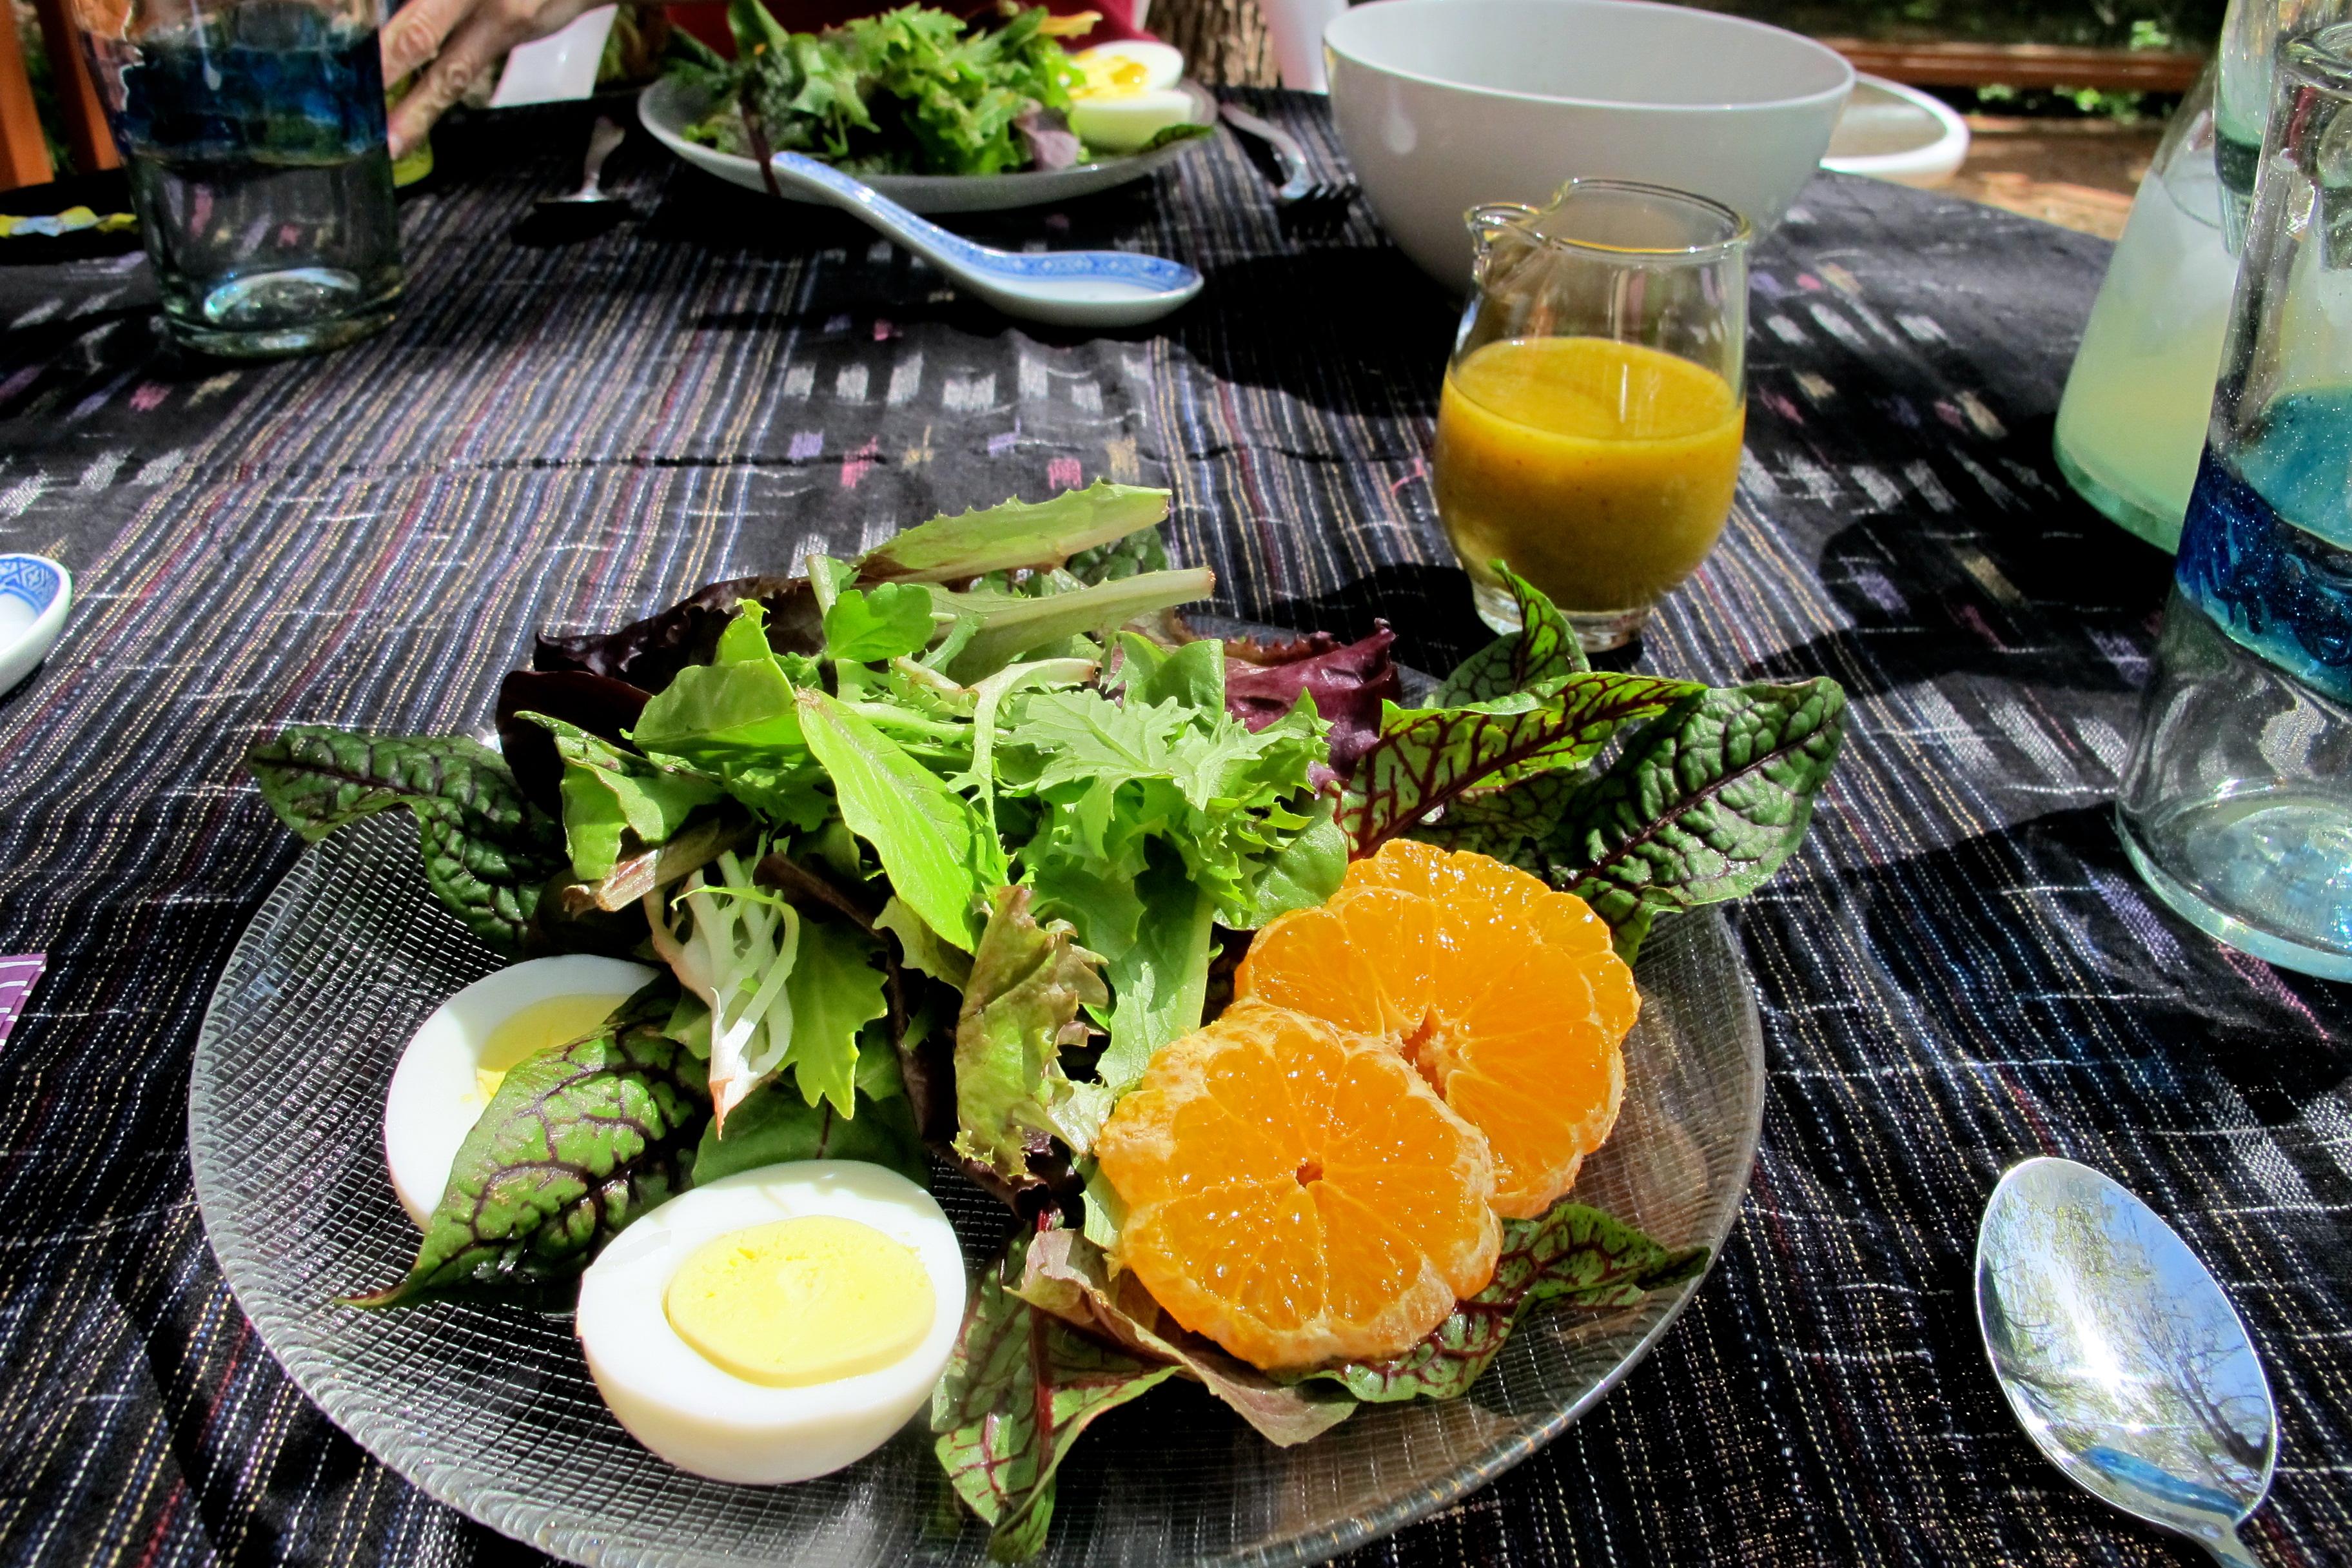 Mixed Salad Green, Hard-Boil Egg and Mandarin Orange with Sweet Chili Vinaigrette